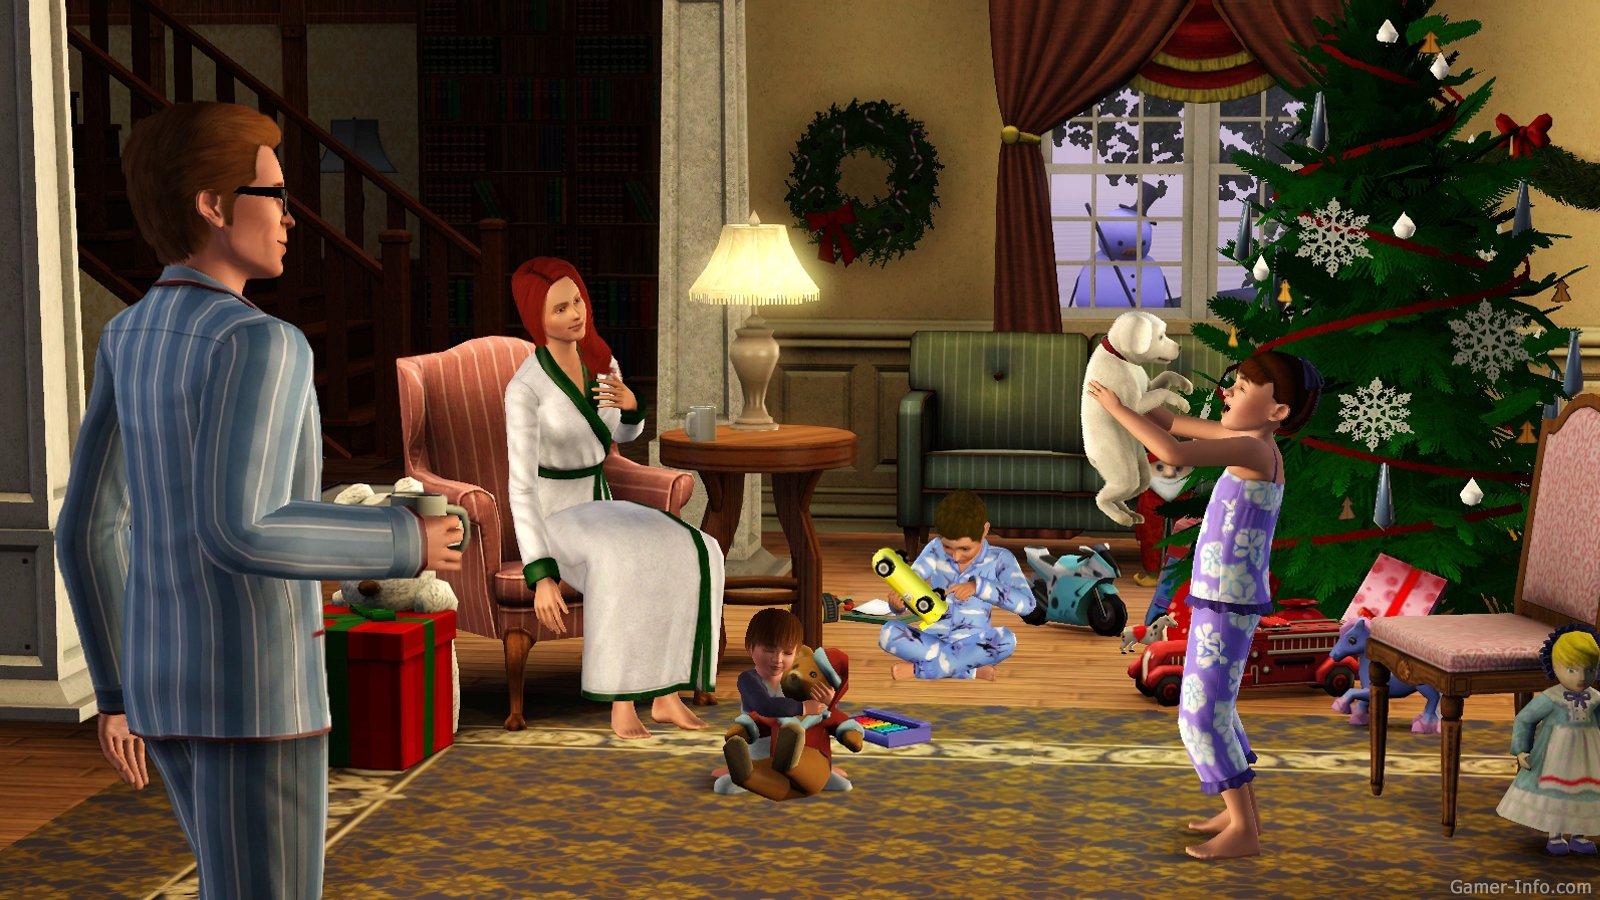 Sims 3 gangbang mod erotic gallery